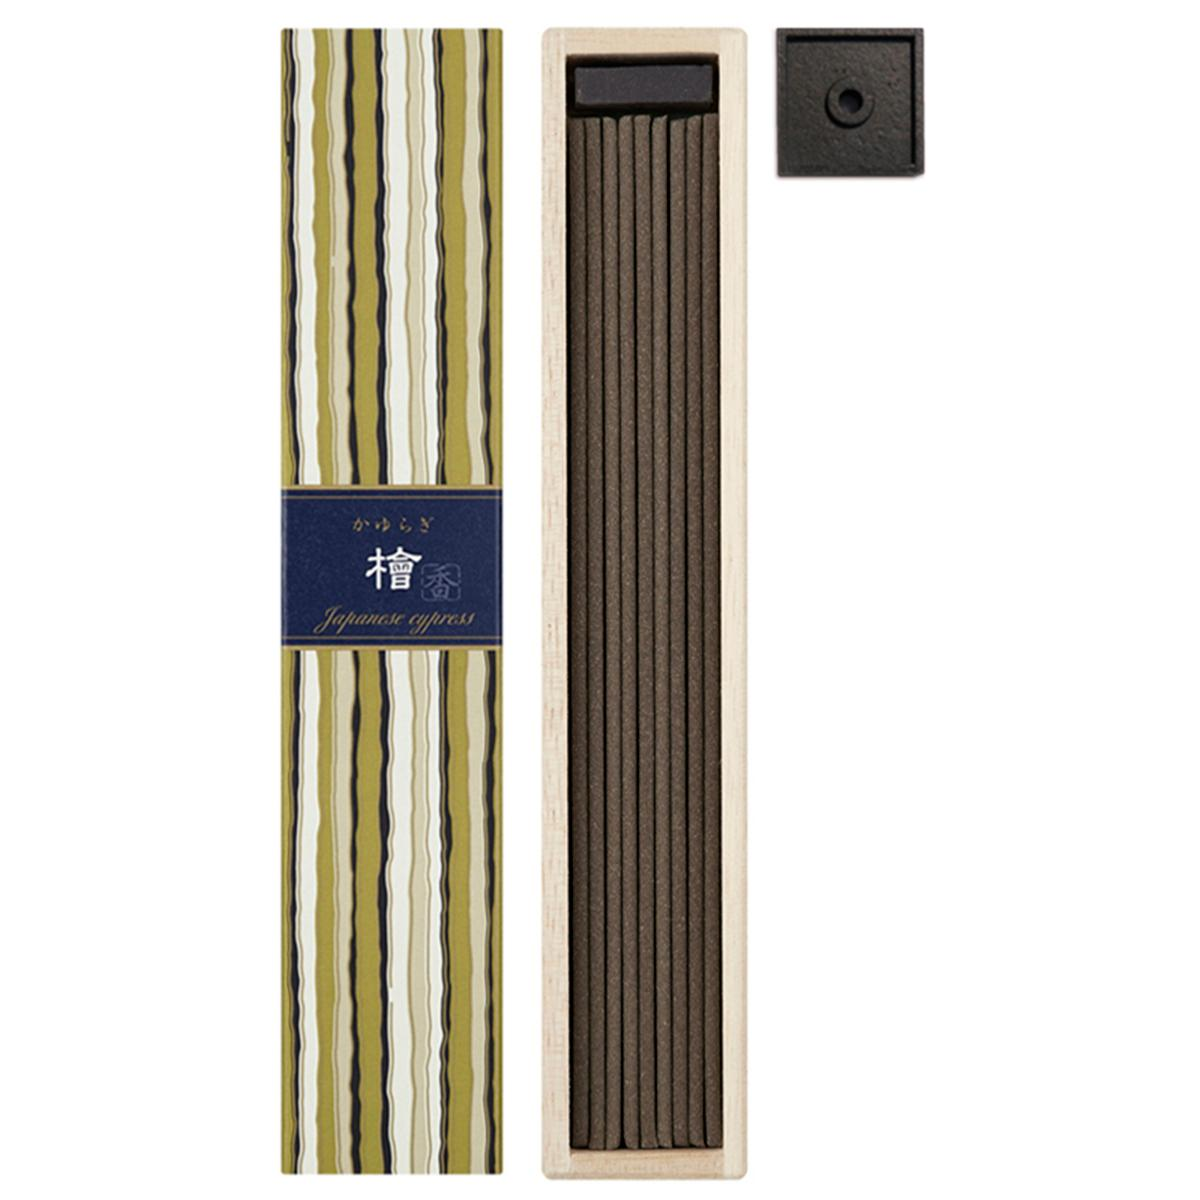 nk-kayuragi-japanese-cypress-zoom.jpg